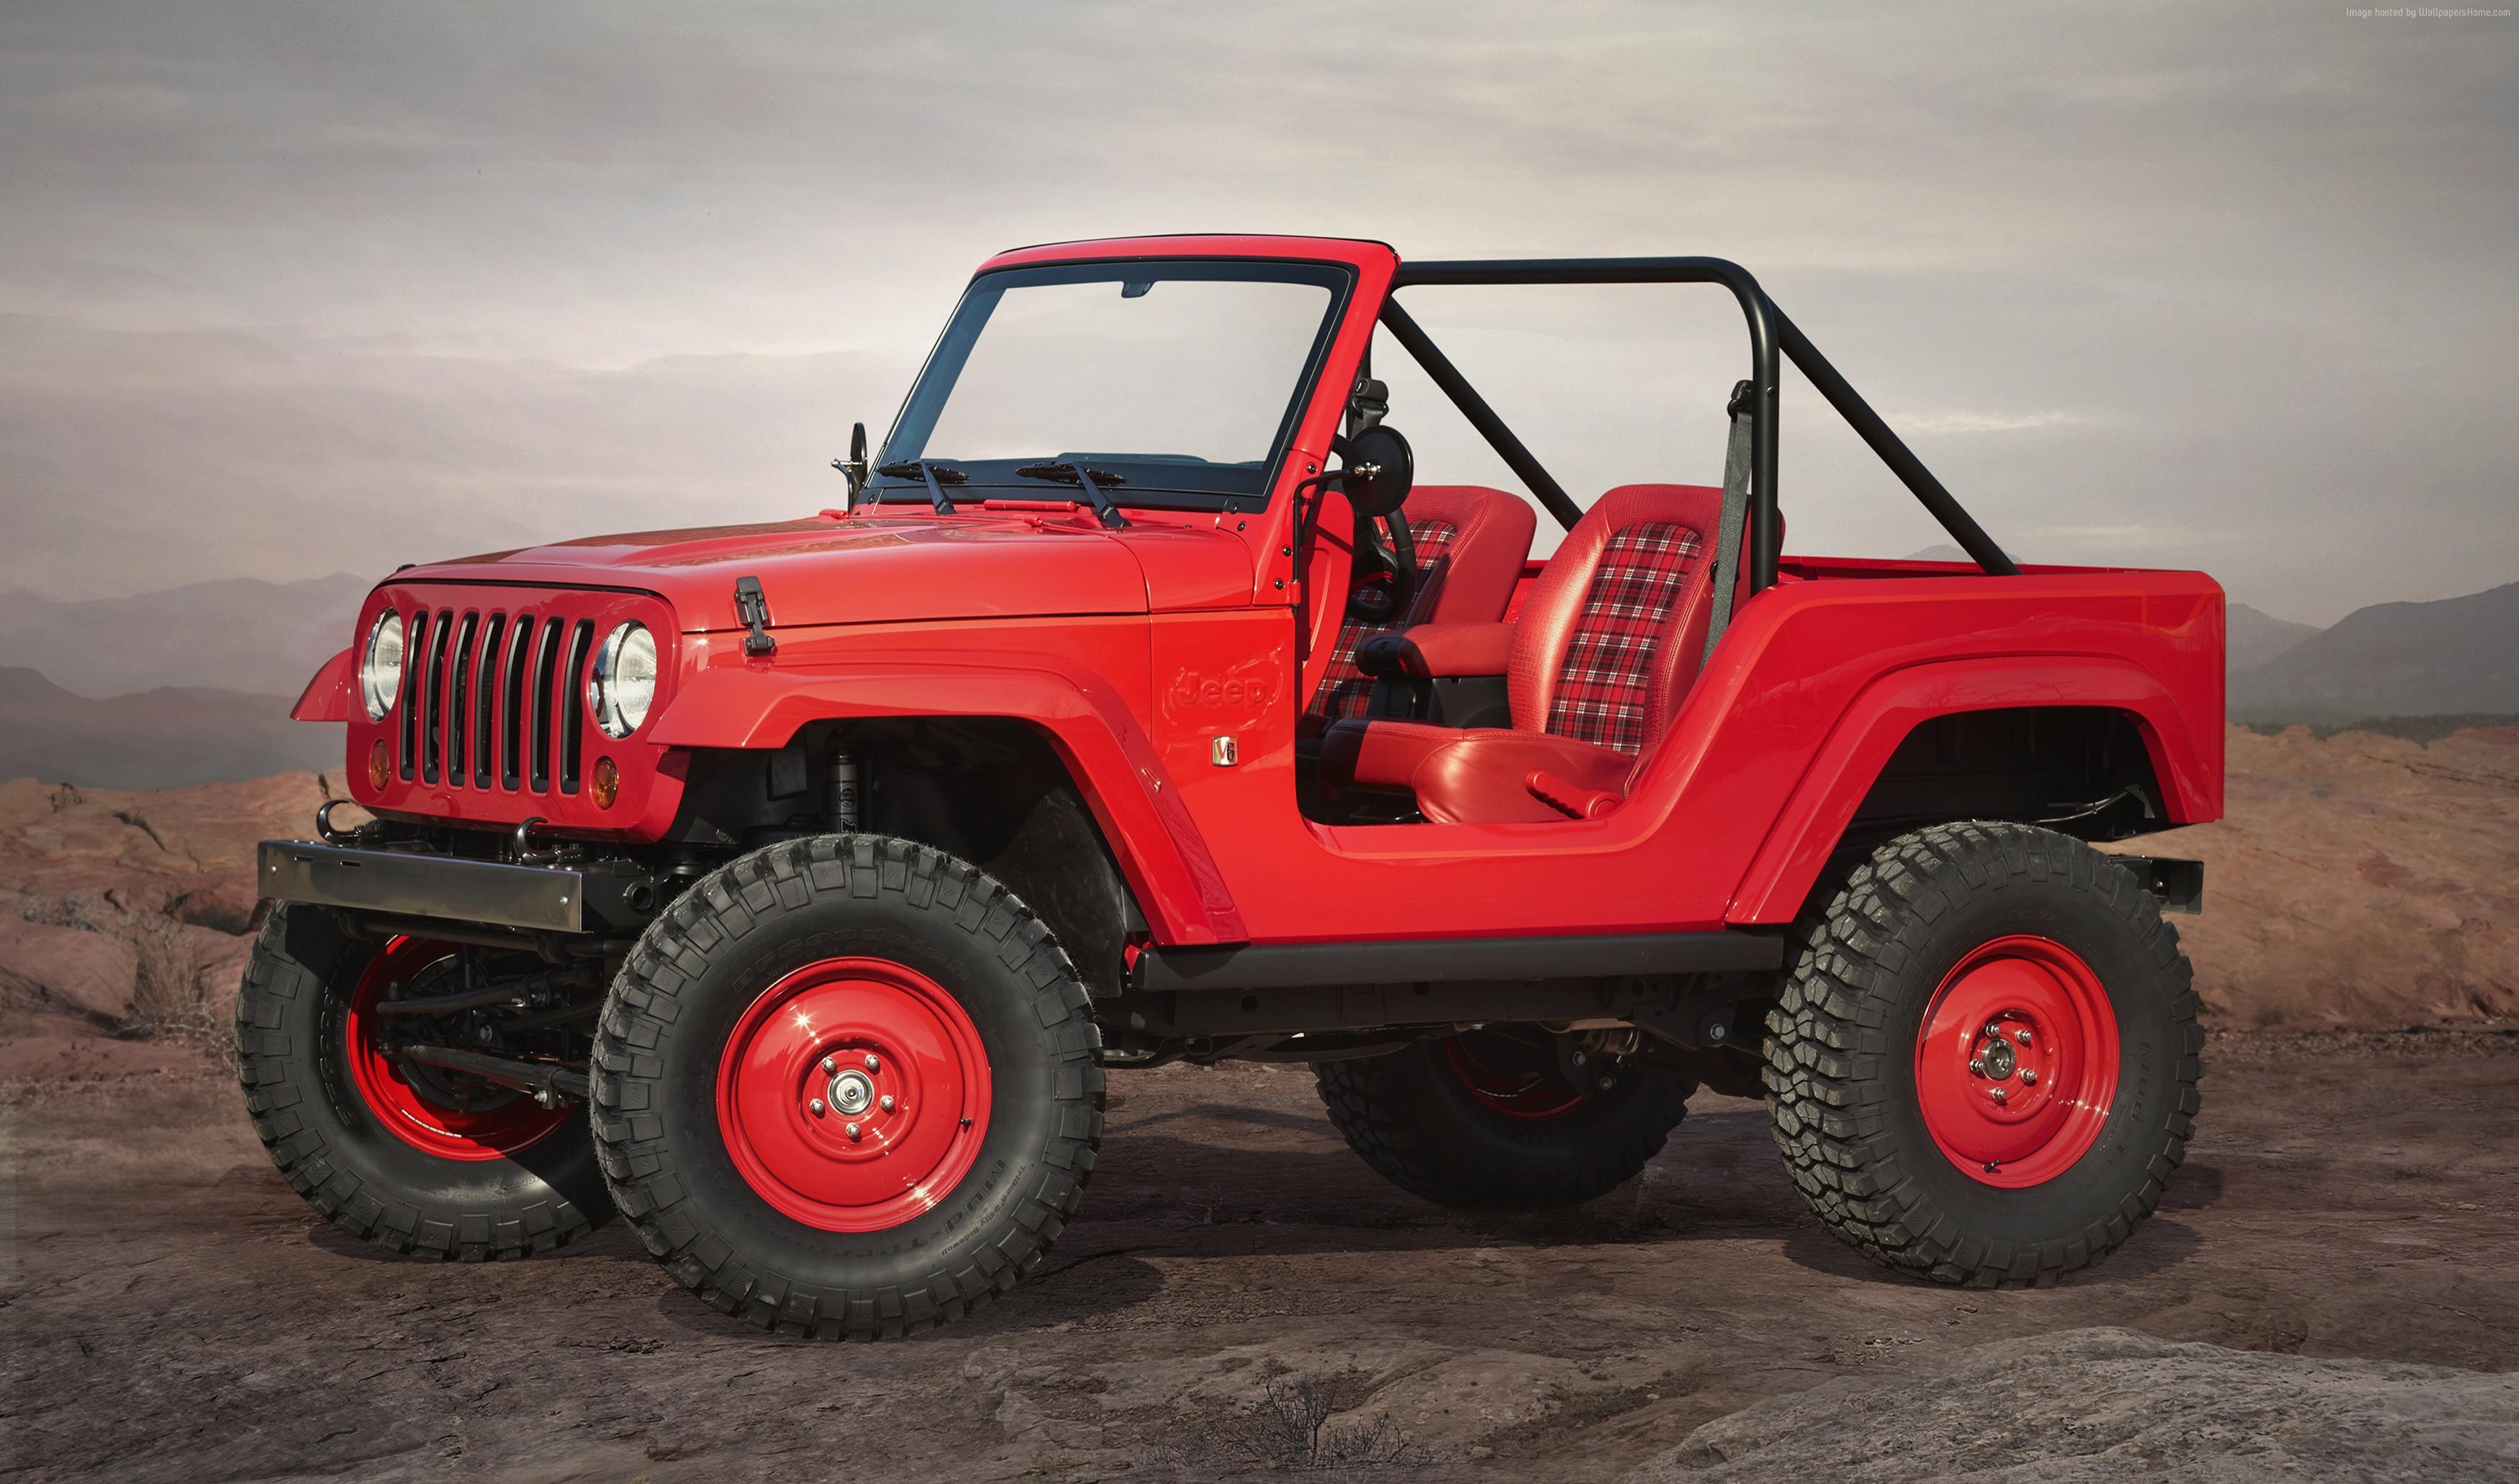 3500x2062 Wallpaper Jeep Shortcut, Moab Easter Jeep Safari 2016, Suv, Cars